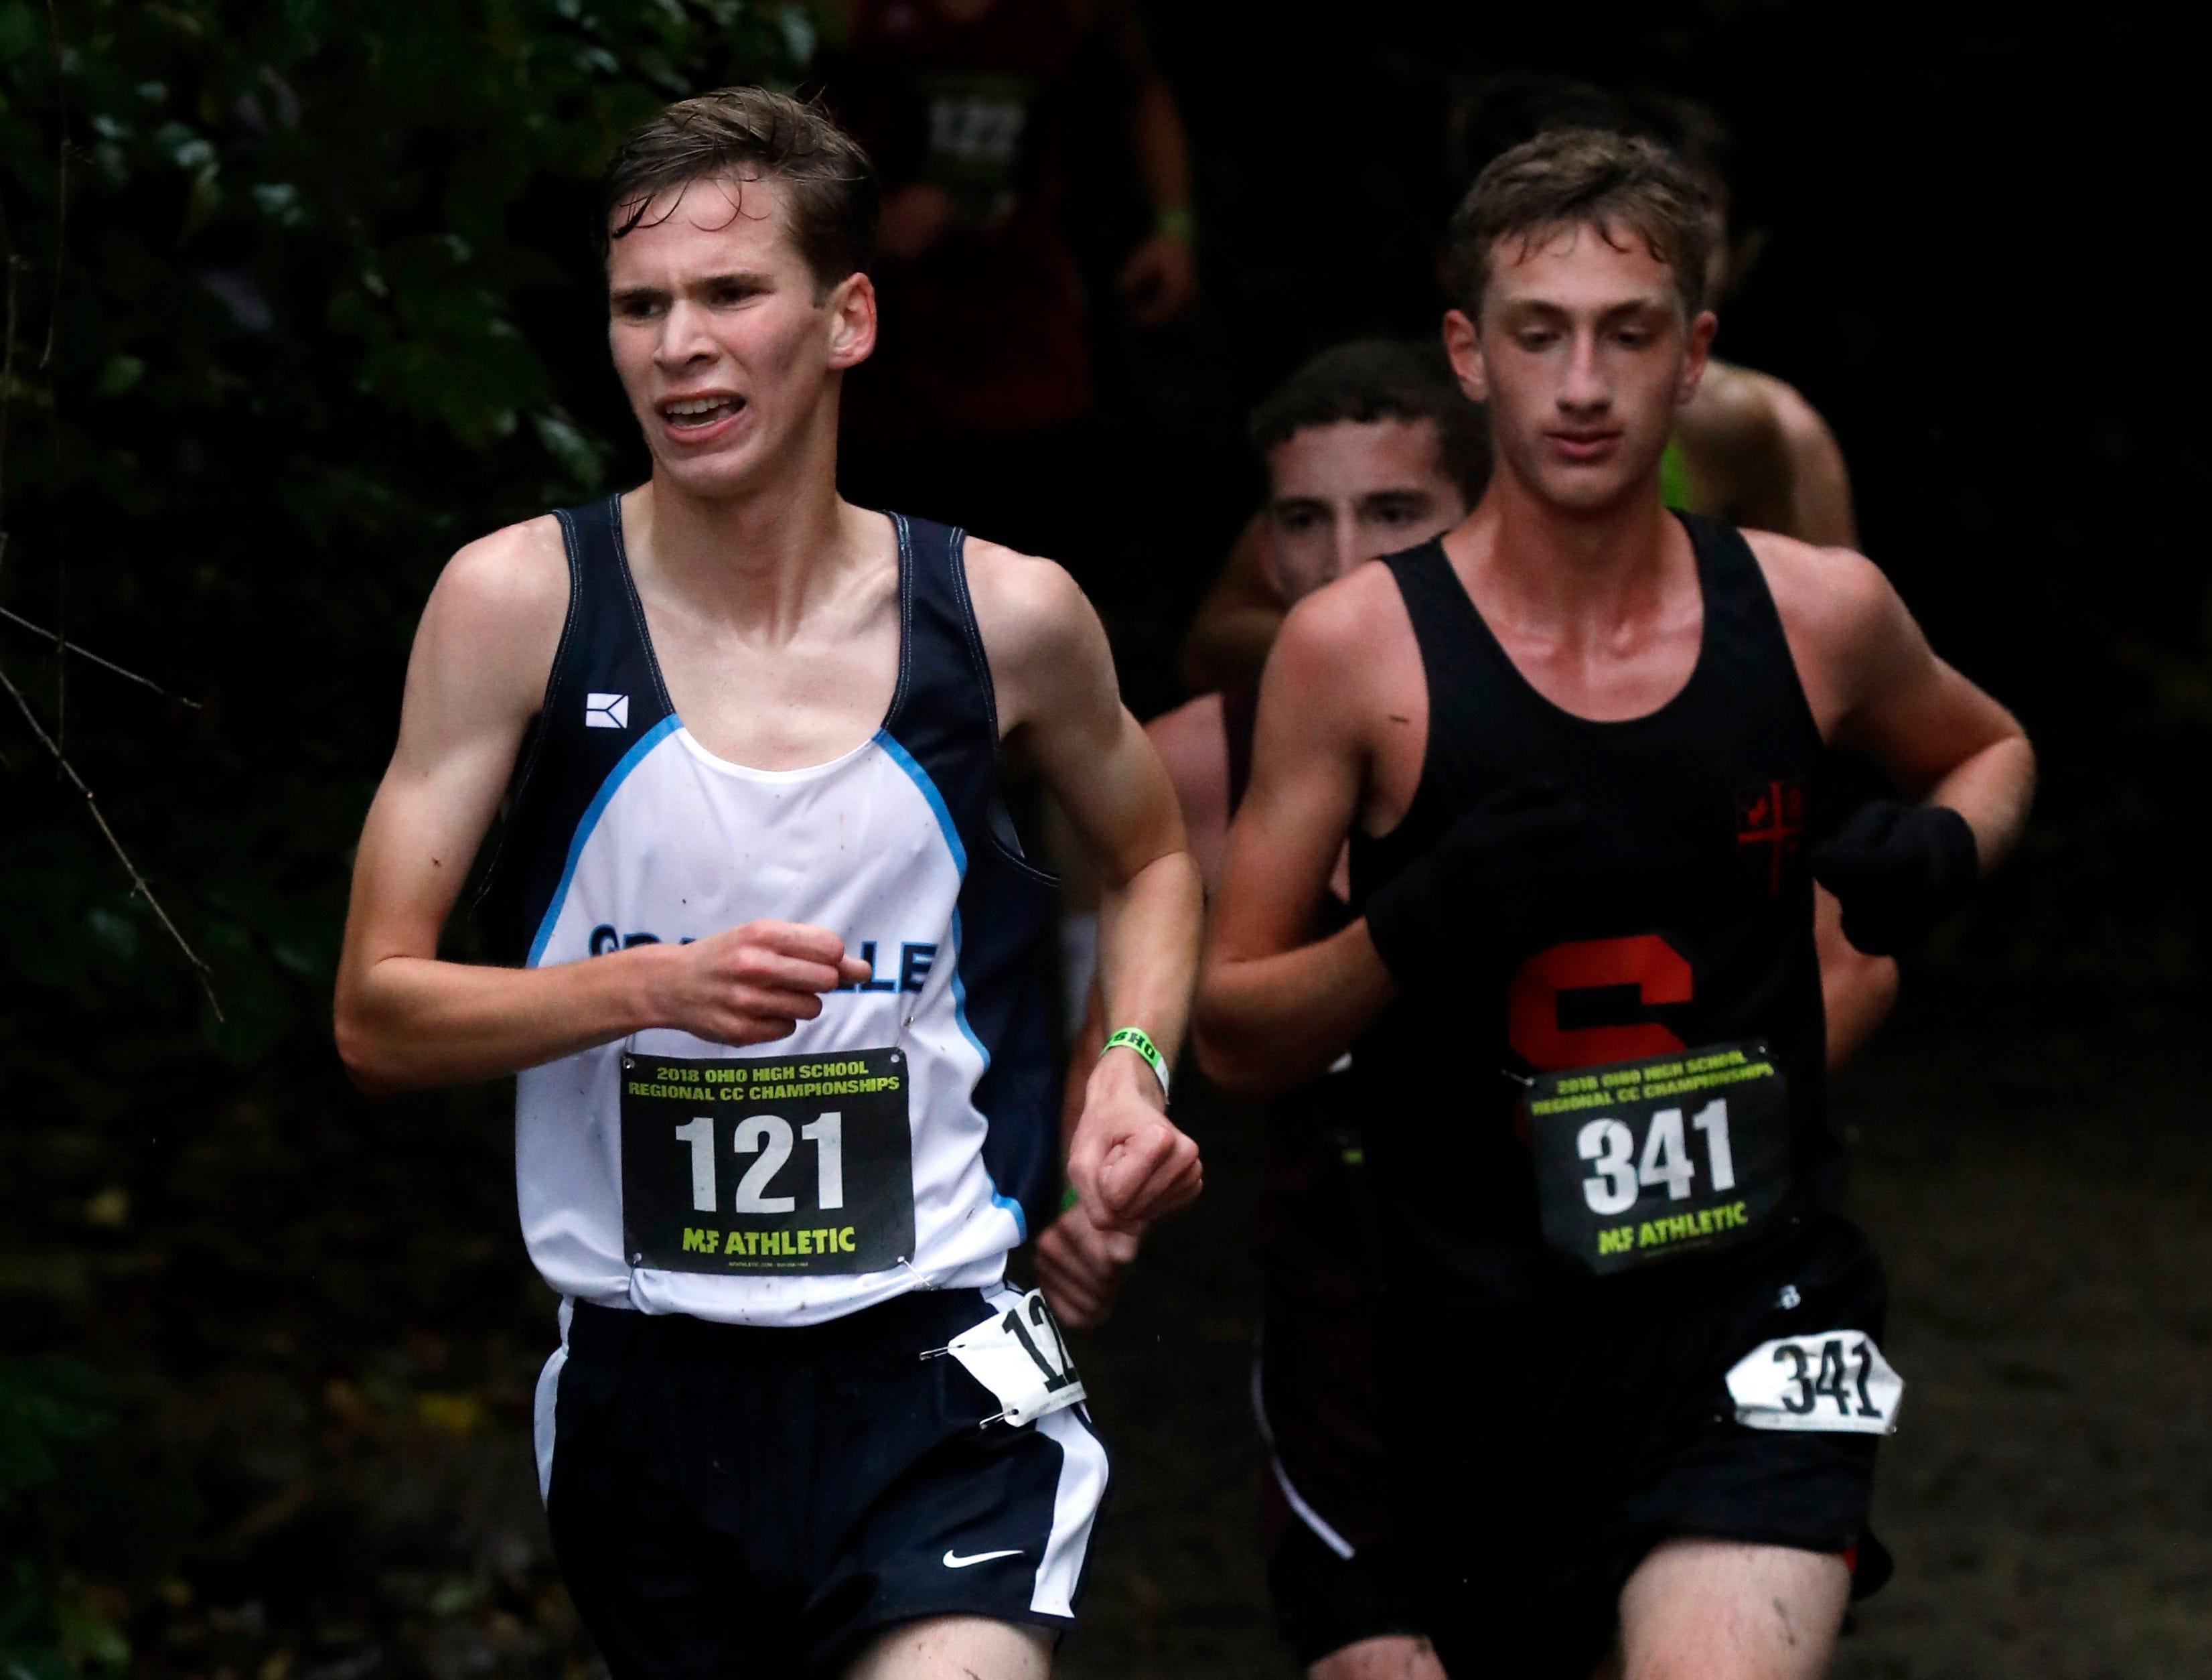 Granville's Jack Burczak runs in the Regional Cross Country meet Saturday, Oct. 27, 2018, at Pickerington North High School in Pickerington.